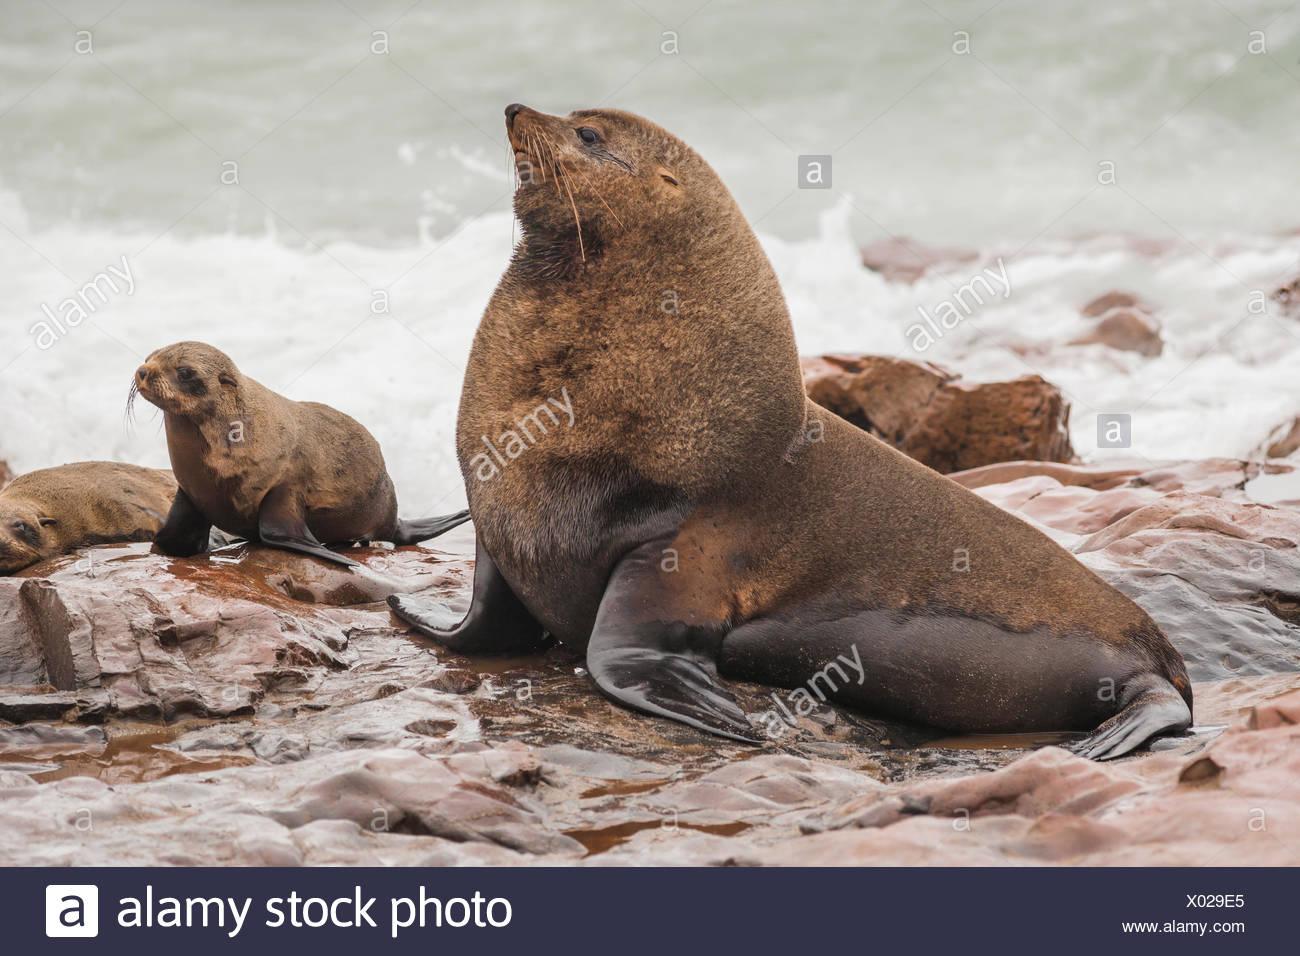 Cape Fur Seal bull showing impress behaviour - Stock Image